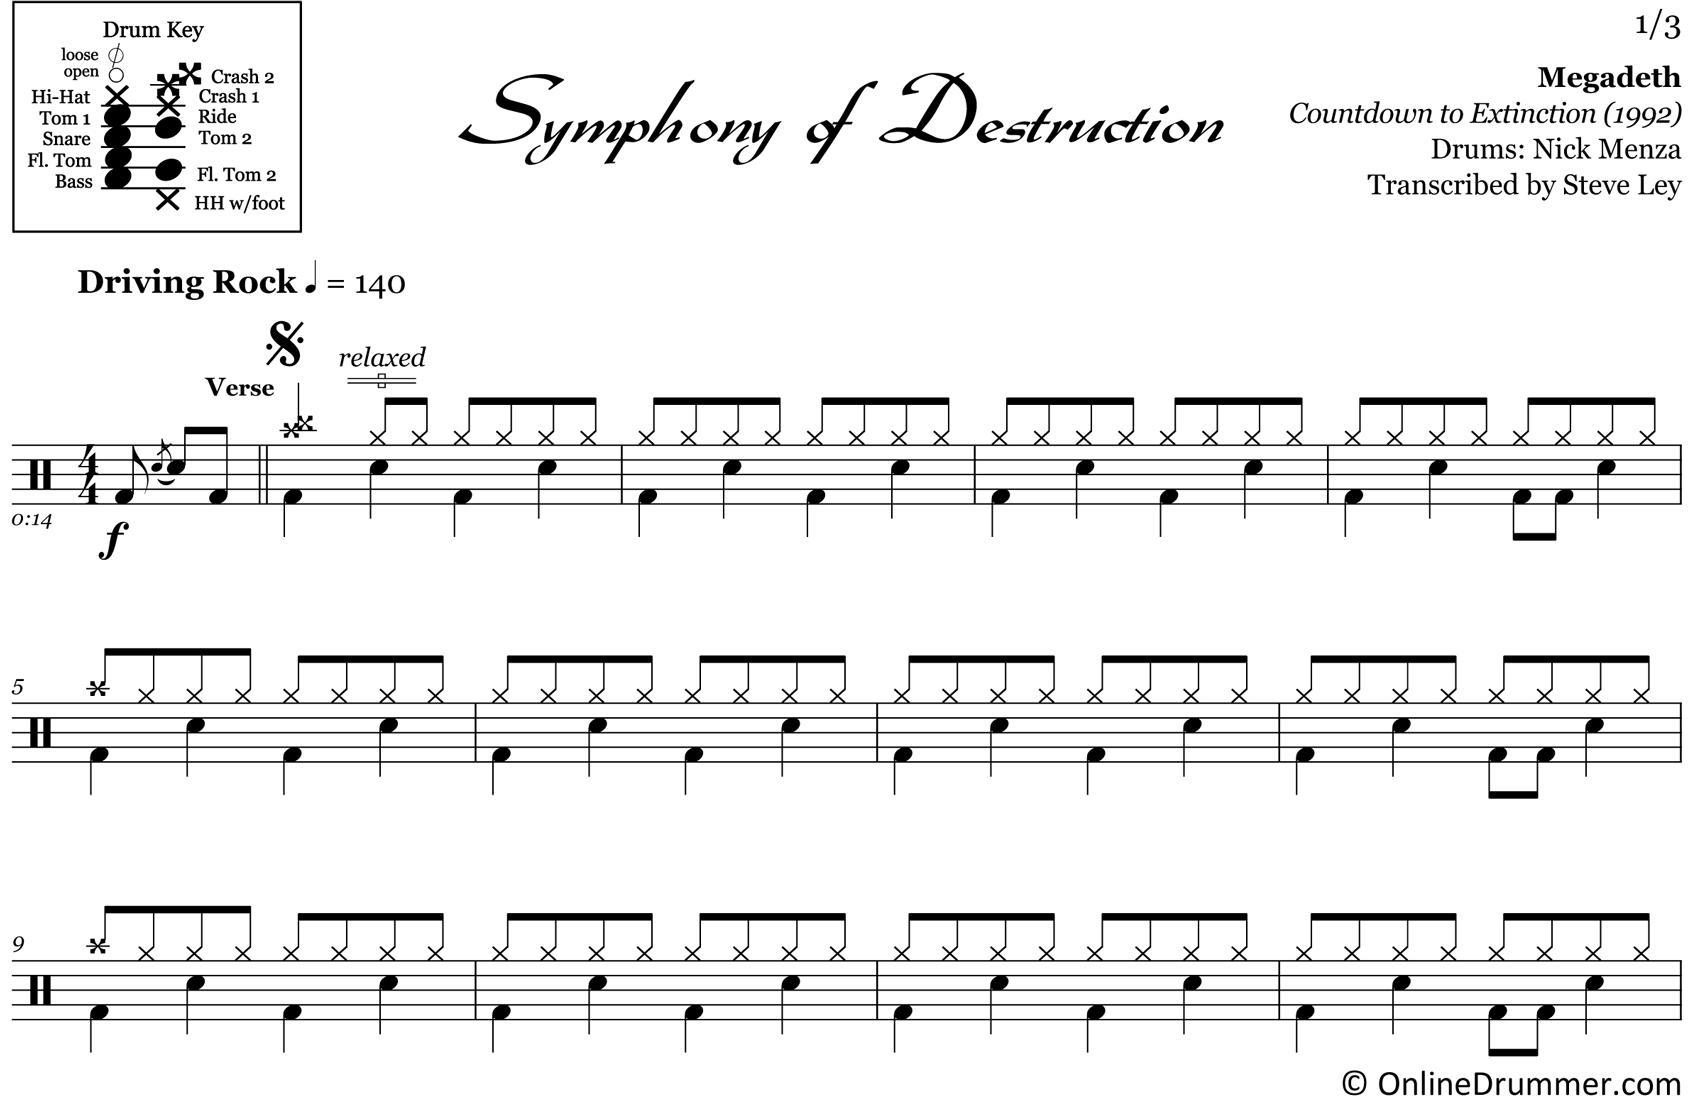 Symphony of Destruction - Megadeth - Drum Sheet Music